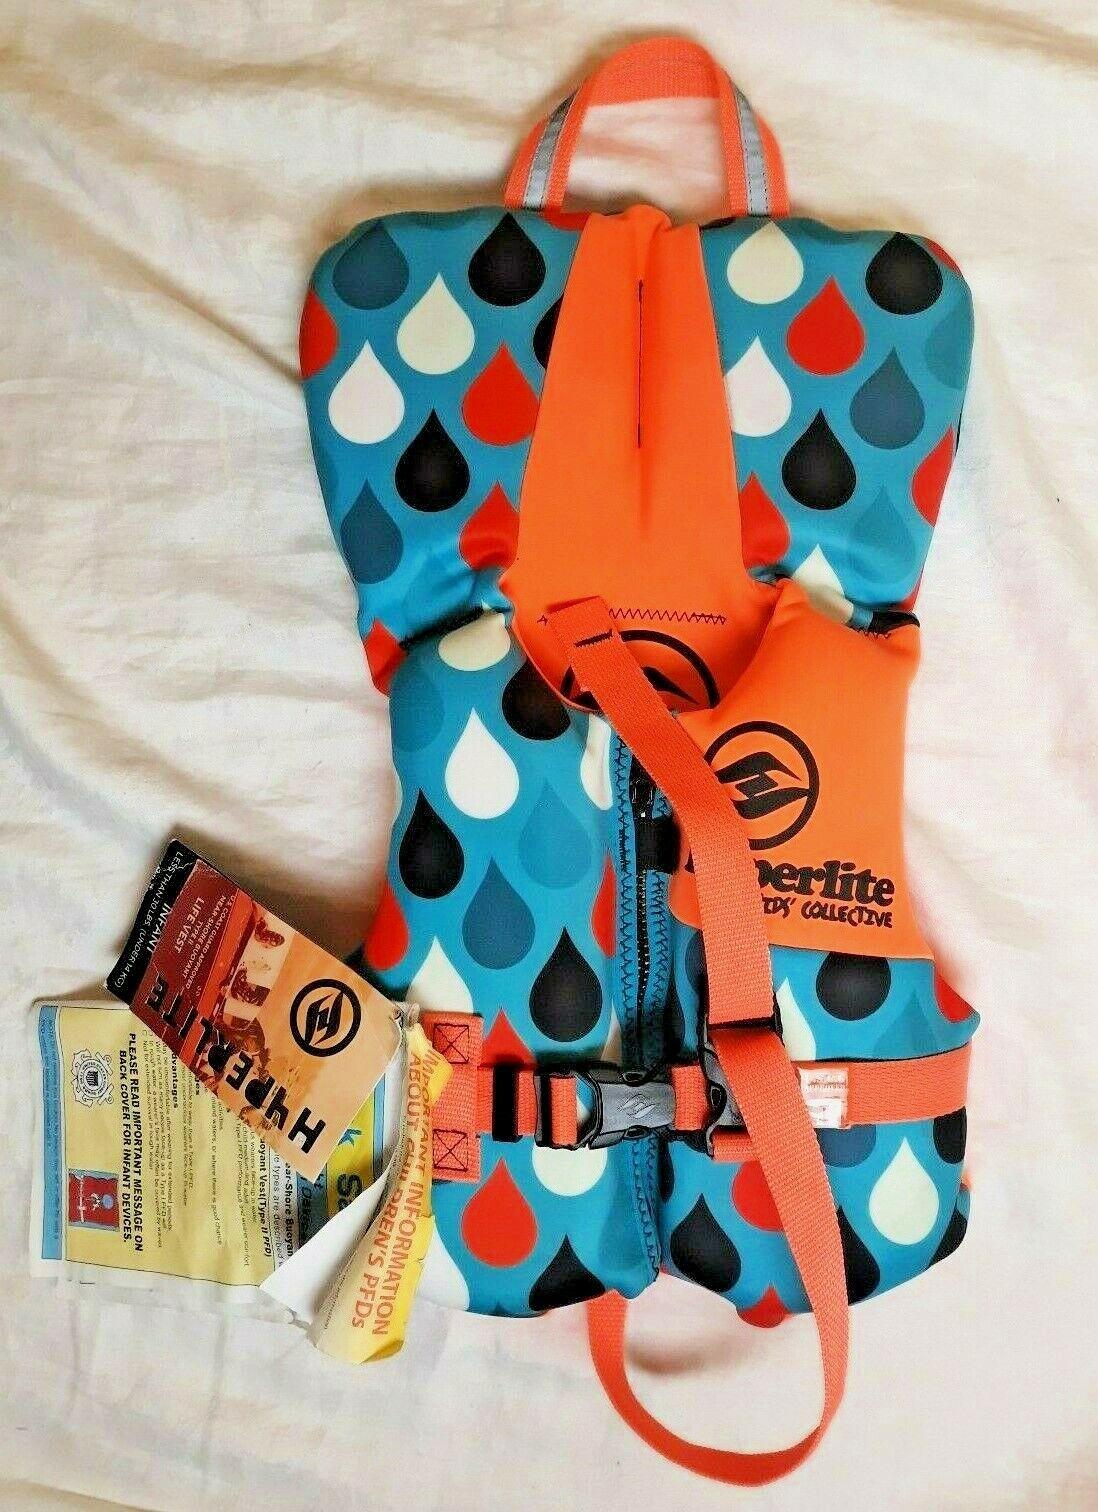 Hyperlite Infants Type II Life Vest, USCG Approved Personal